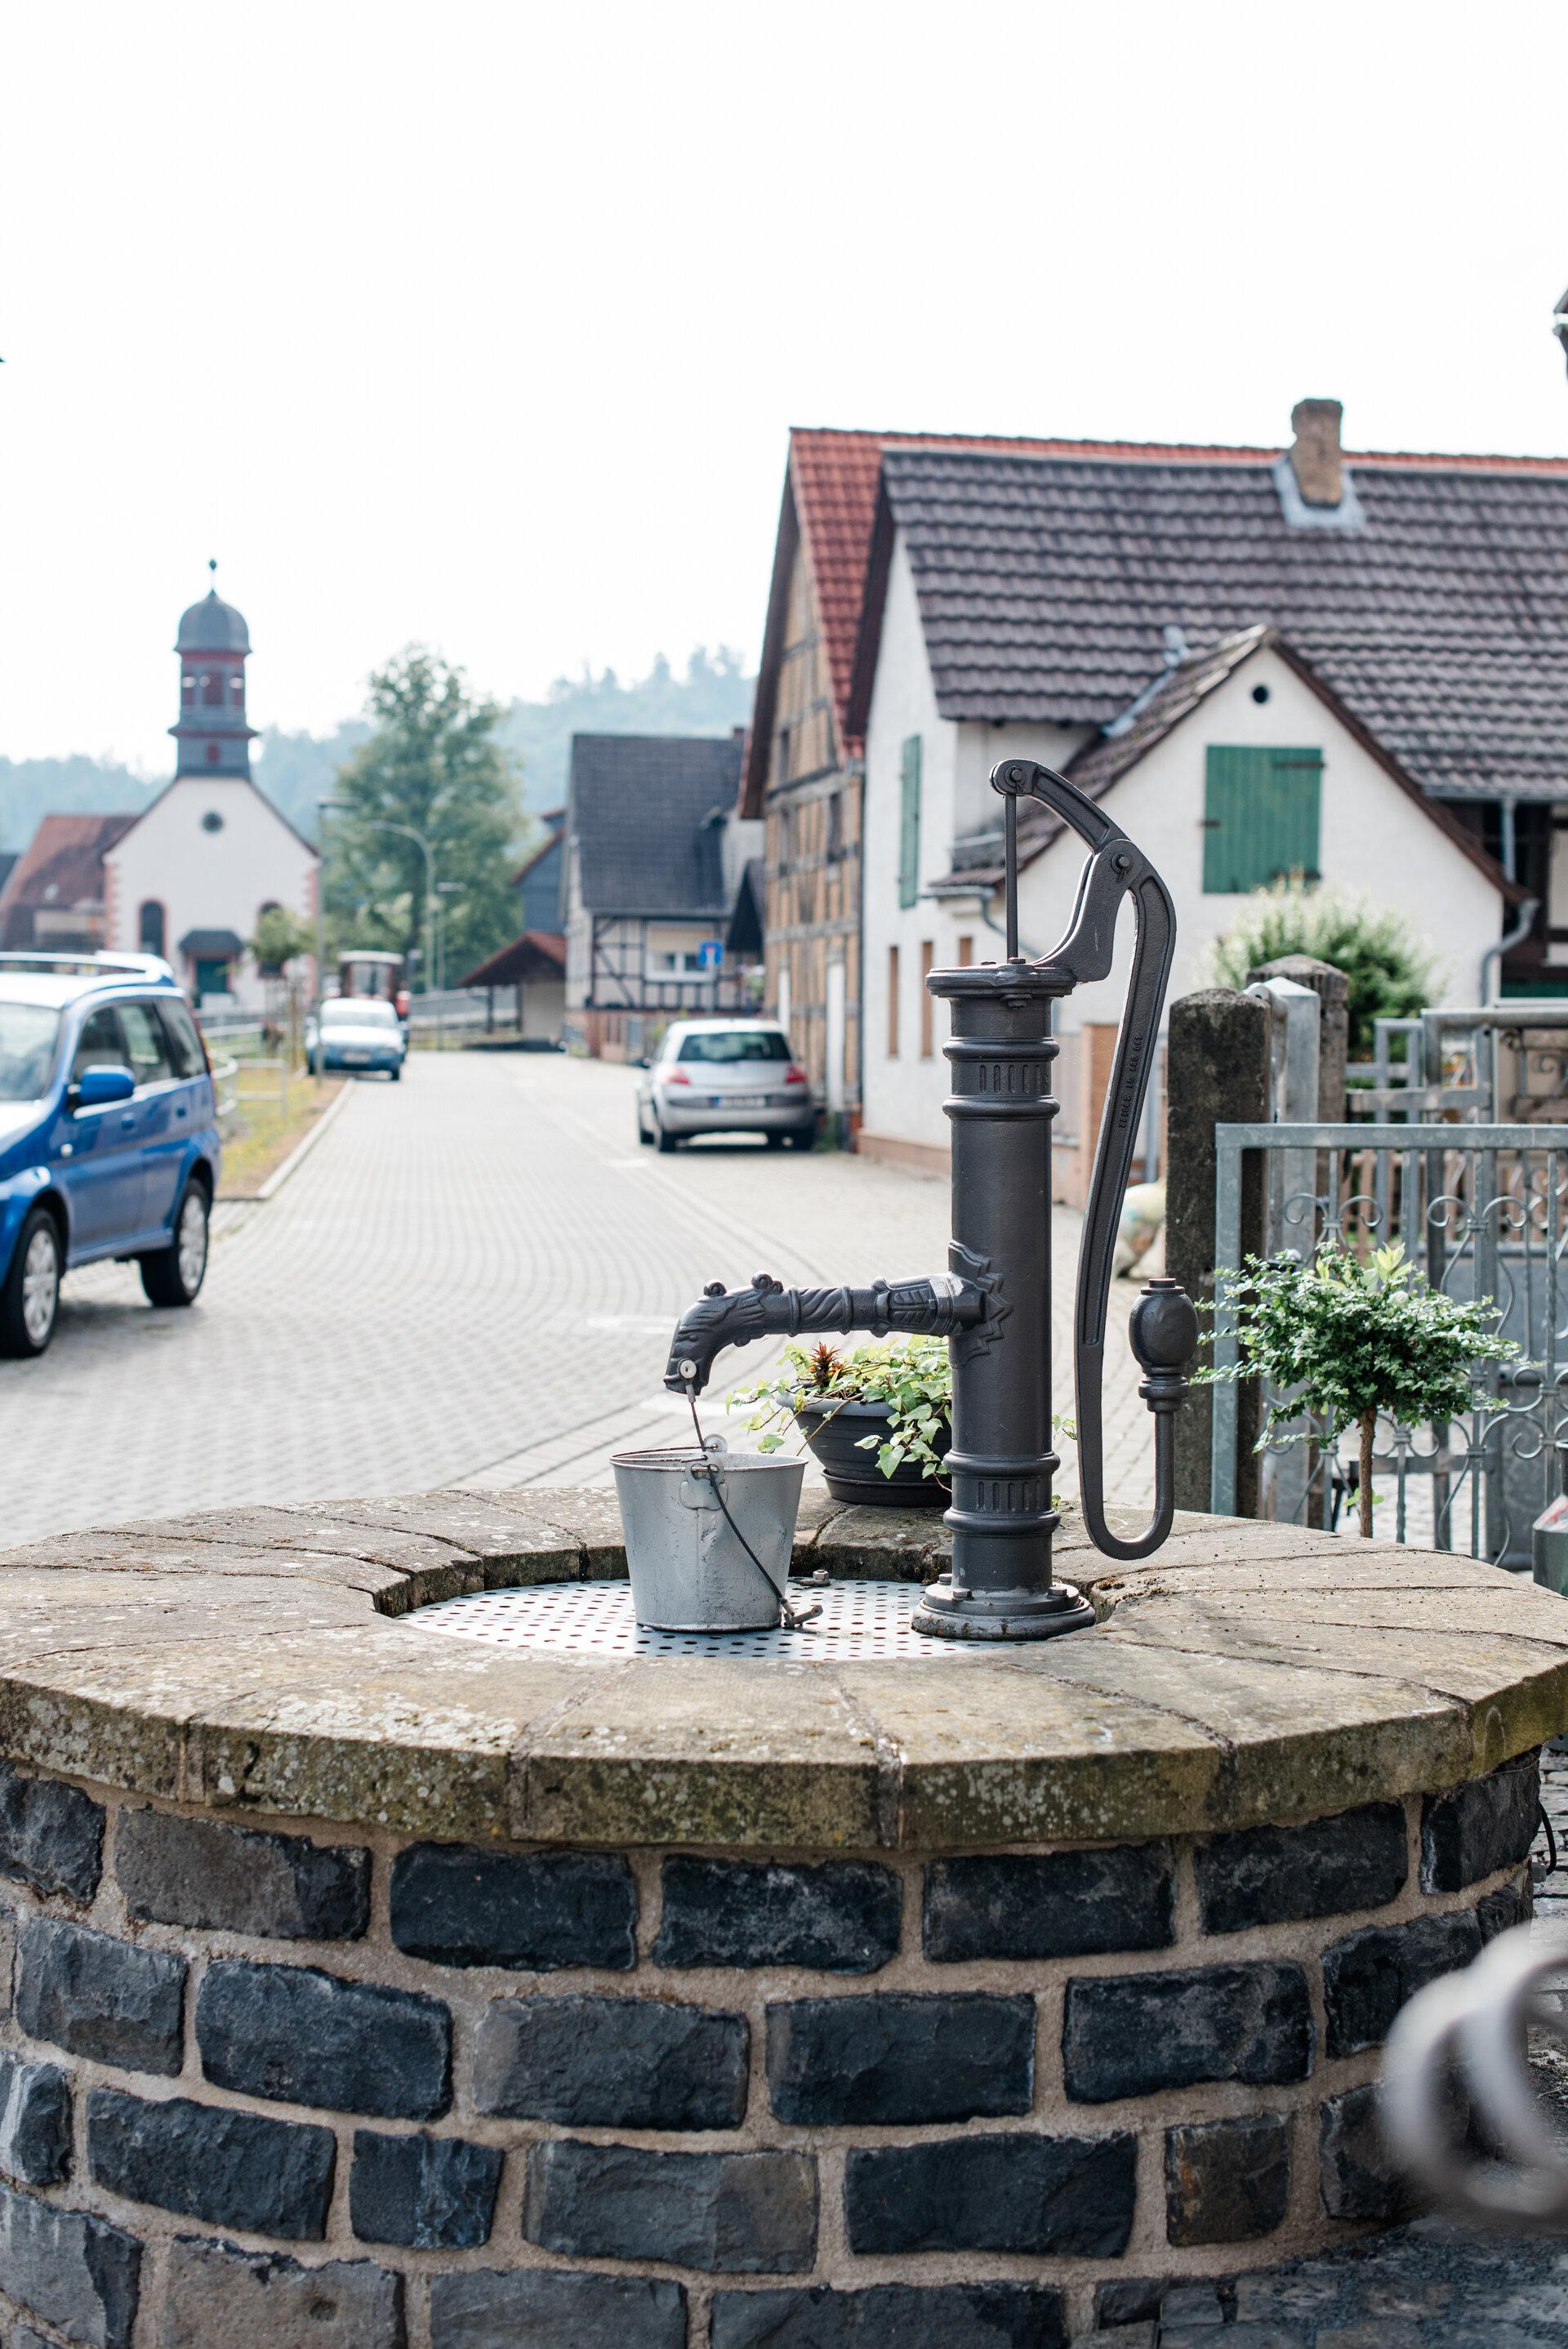 Brunnen in Bergheim